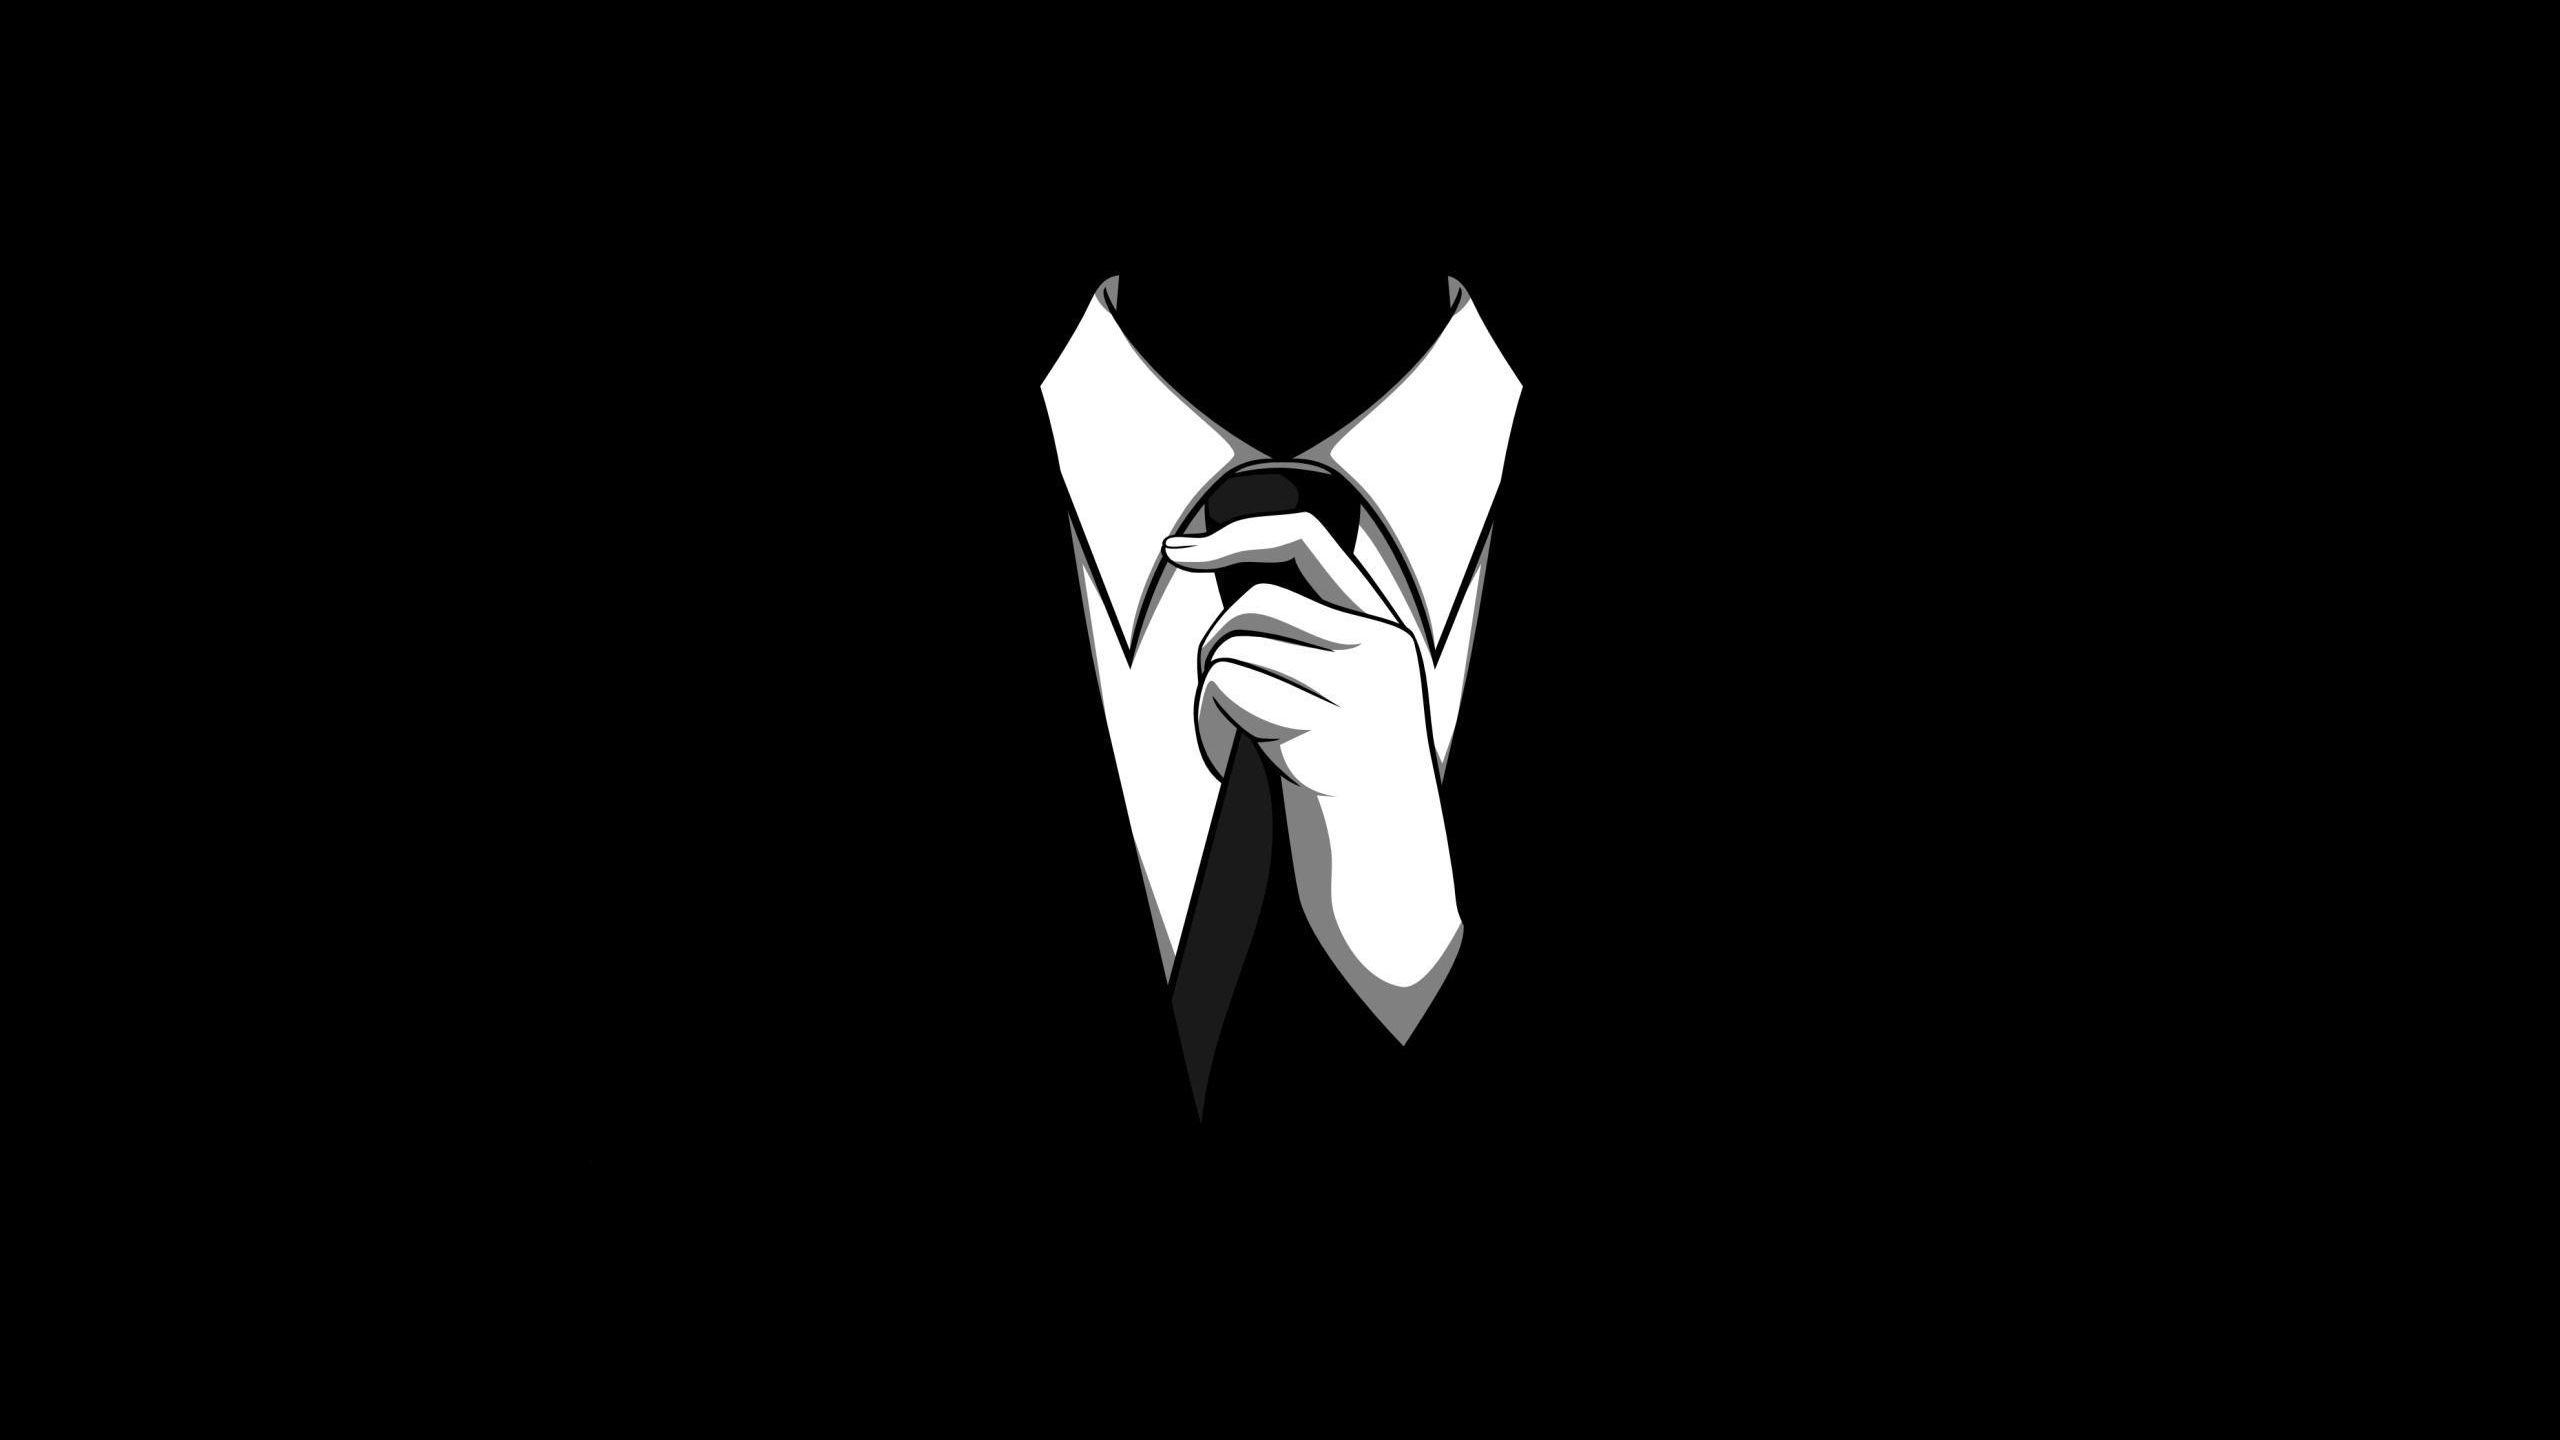 anonymous desktop background